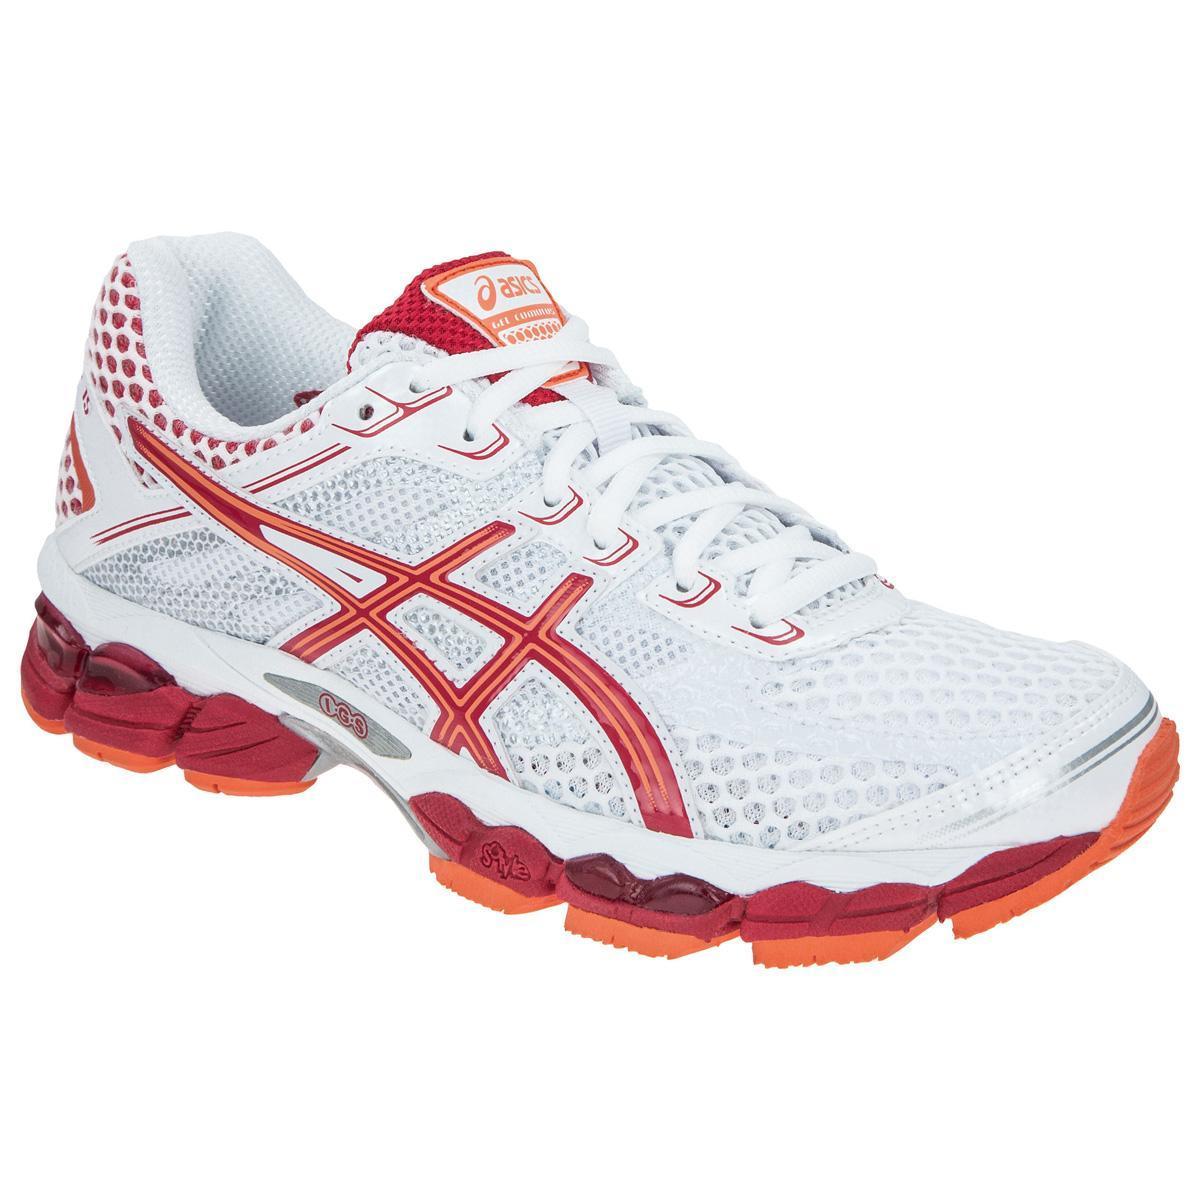 a8cab8ebe1b Asics Womens GEL Cumulus 15 Running Shoes - White Orange - Tennisnuts.com